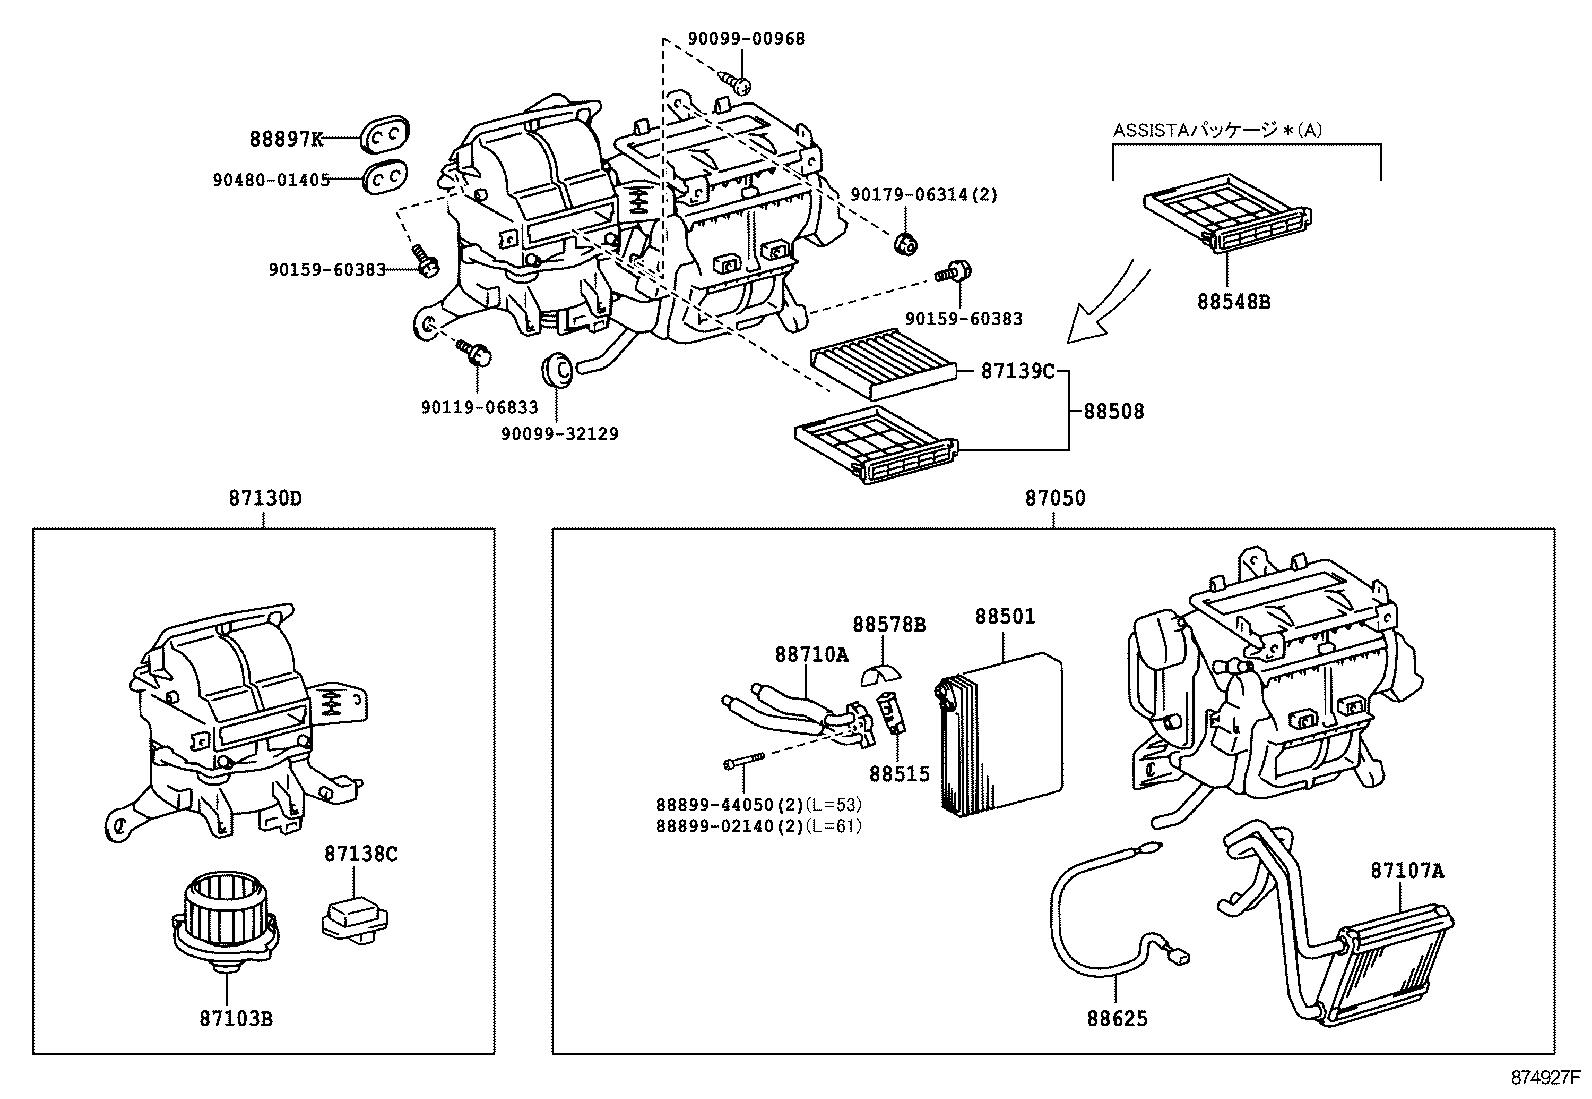 Nze121 Corolla Wiring Diagram. . Wiring Diagram on